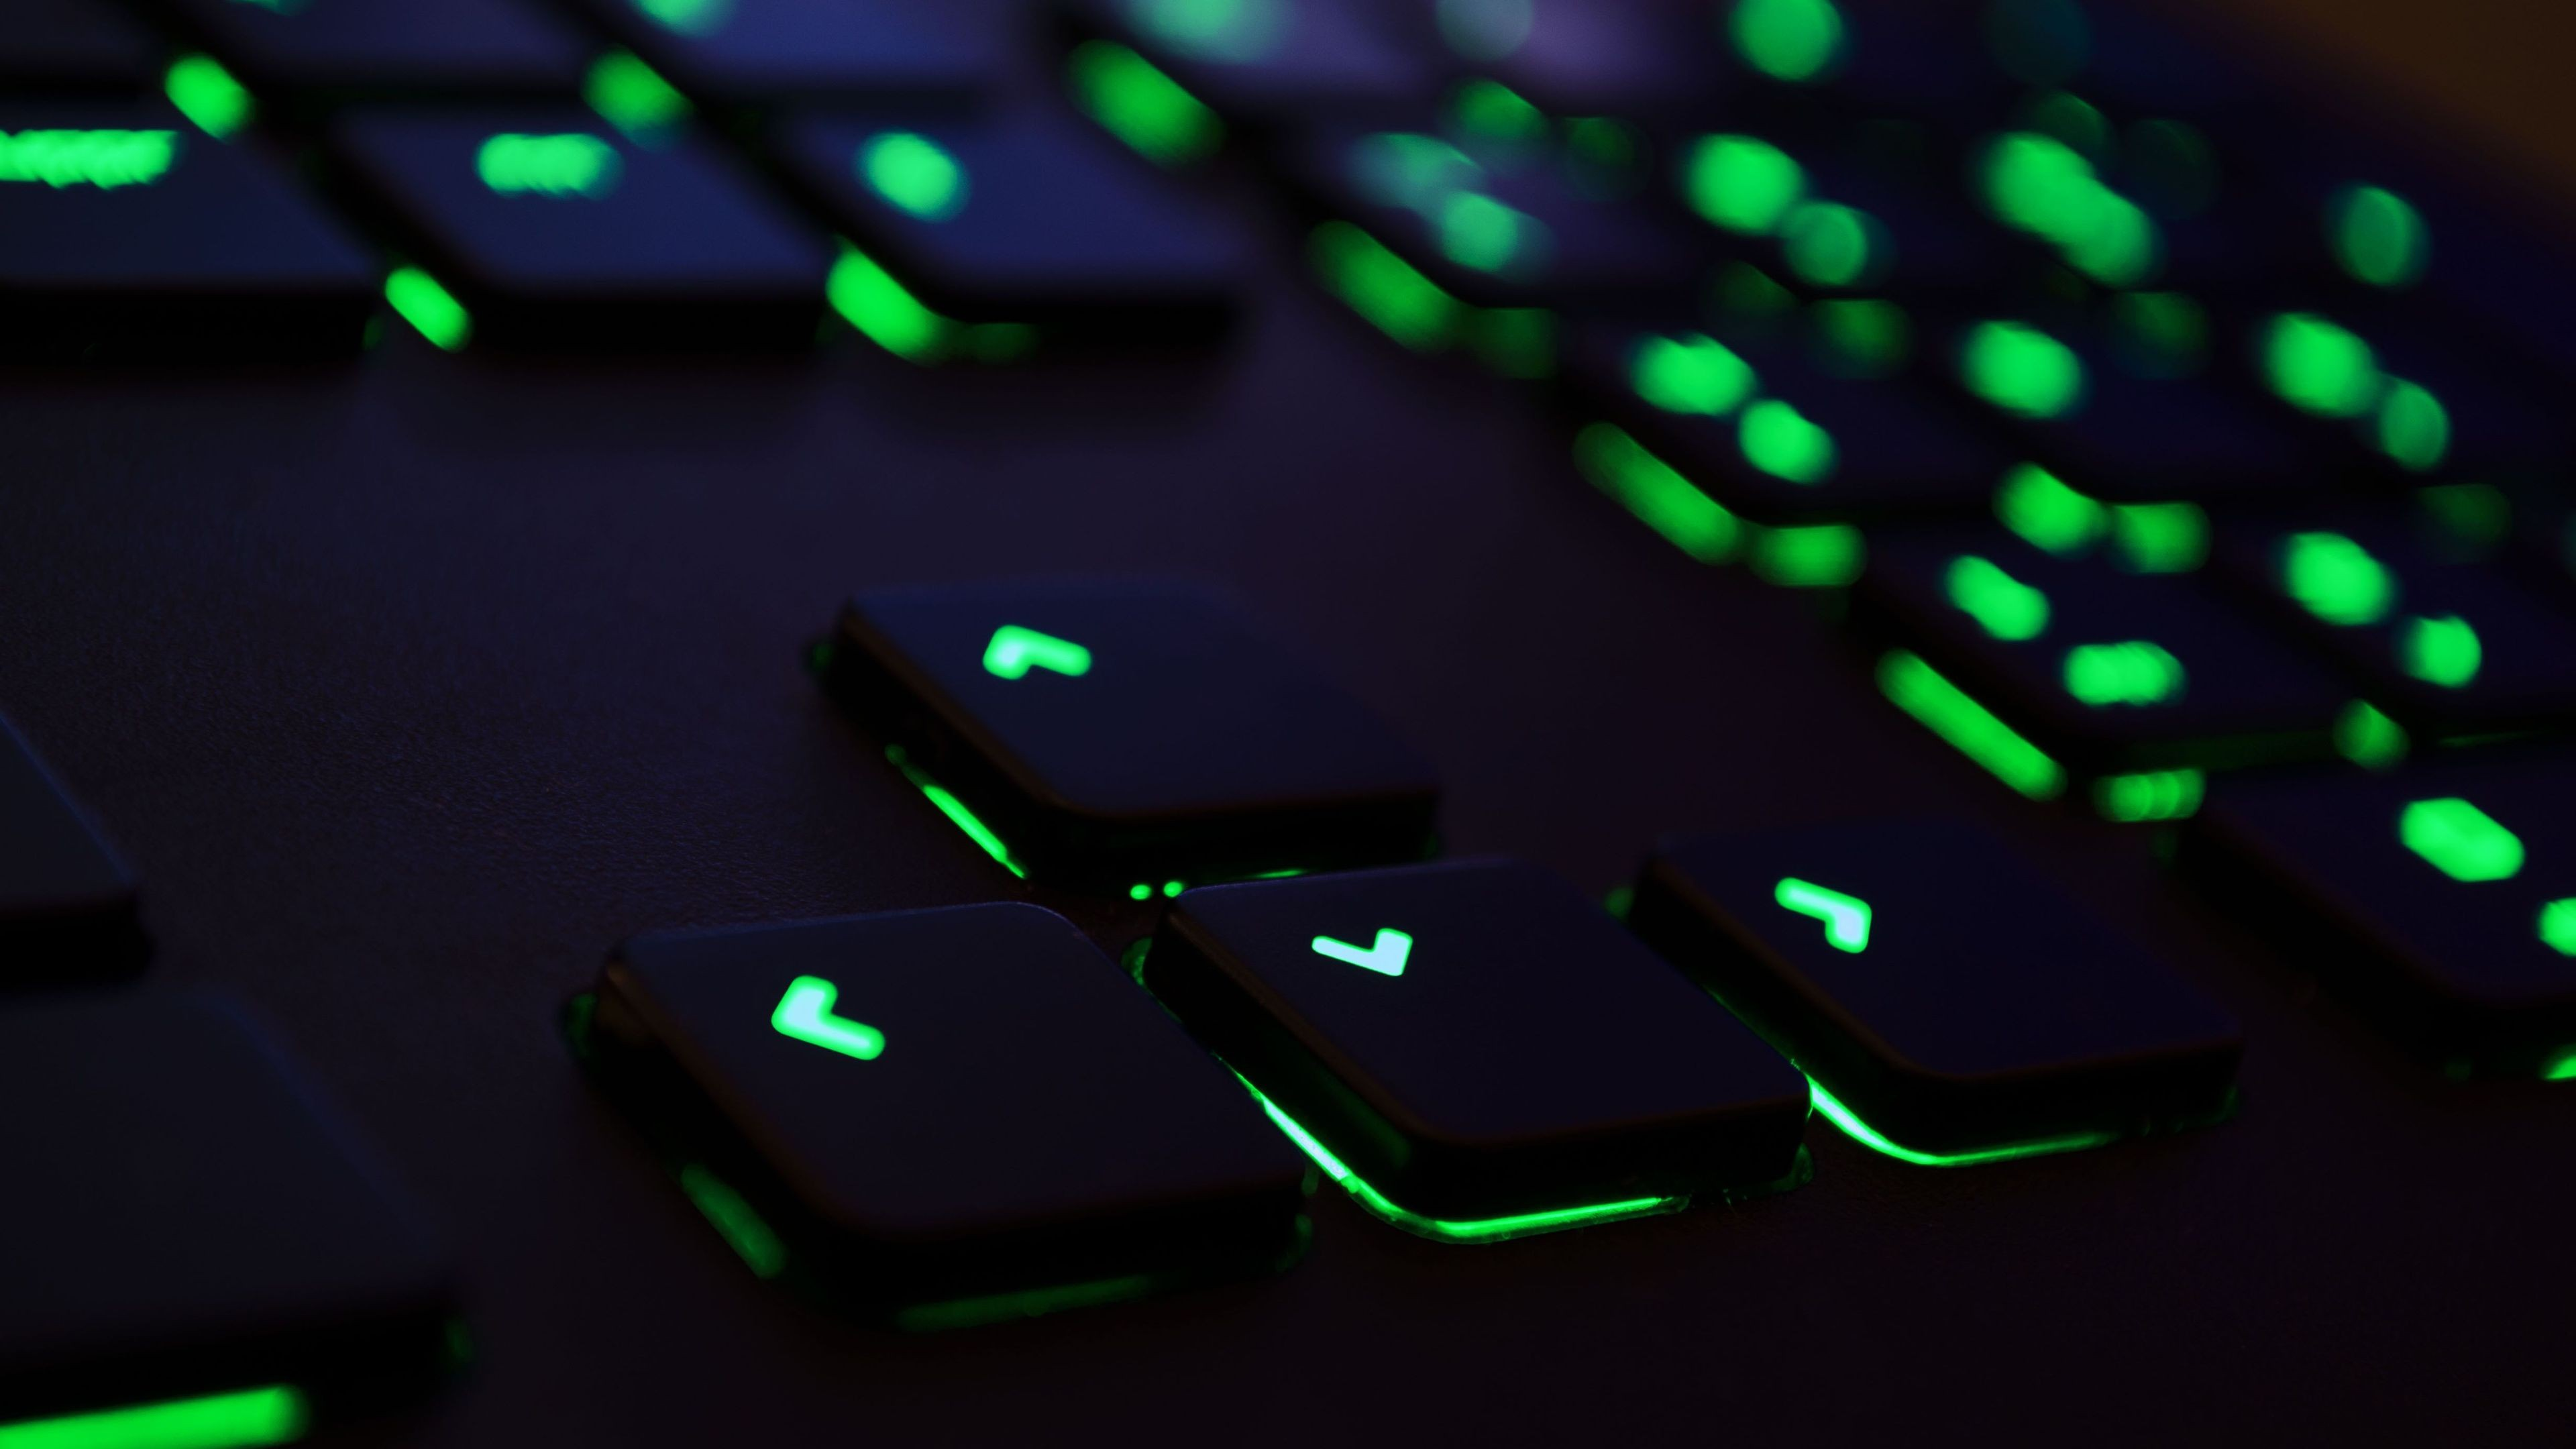 Razer Green Keyboard 4K Wallpapers 3840x2160